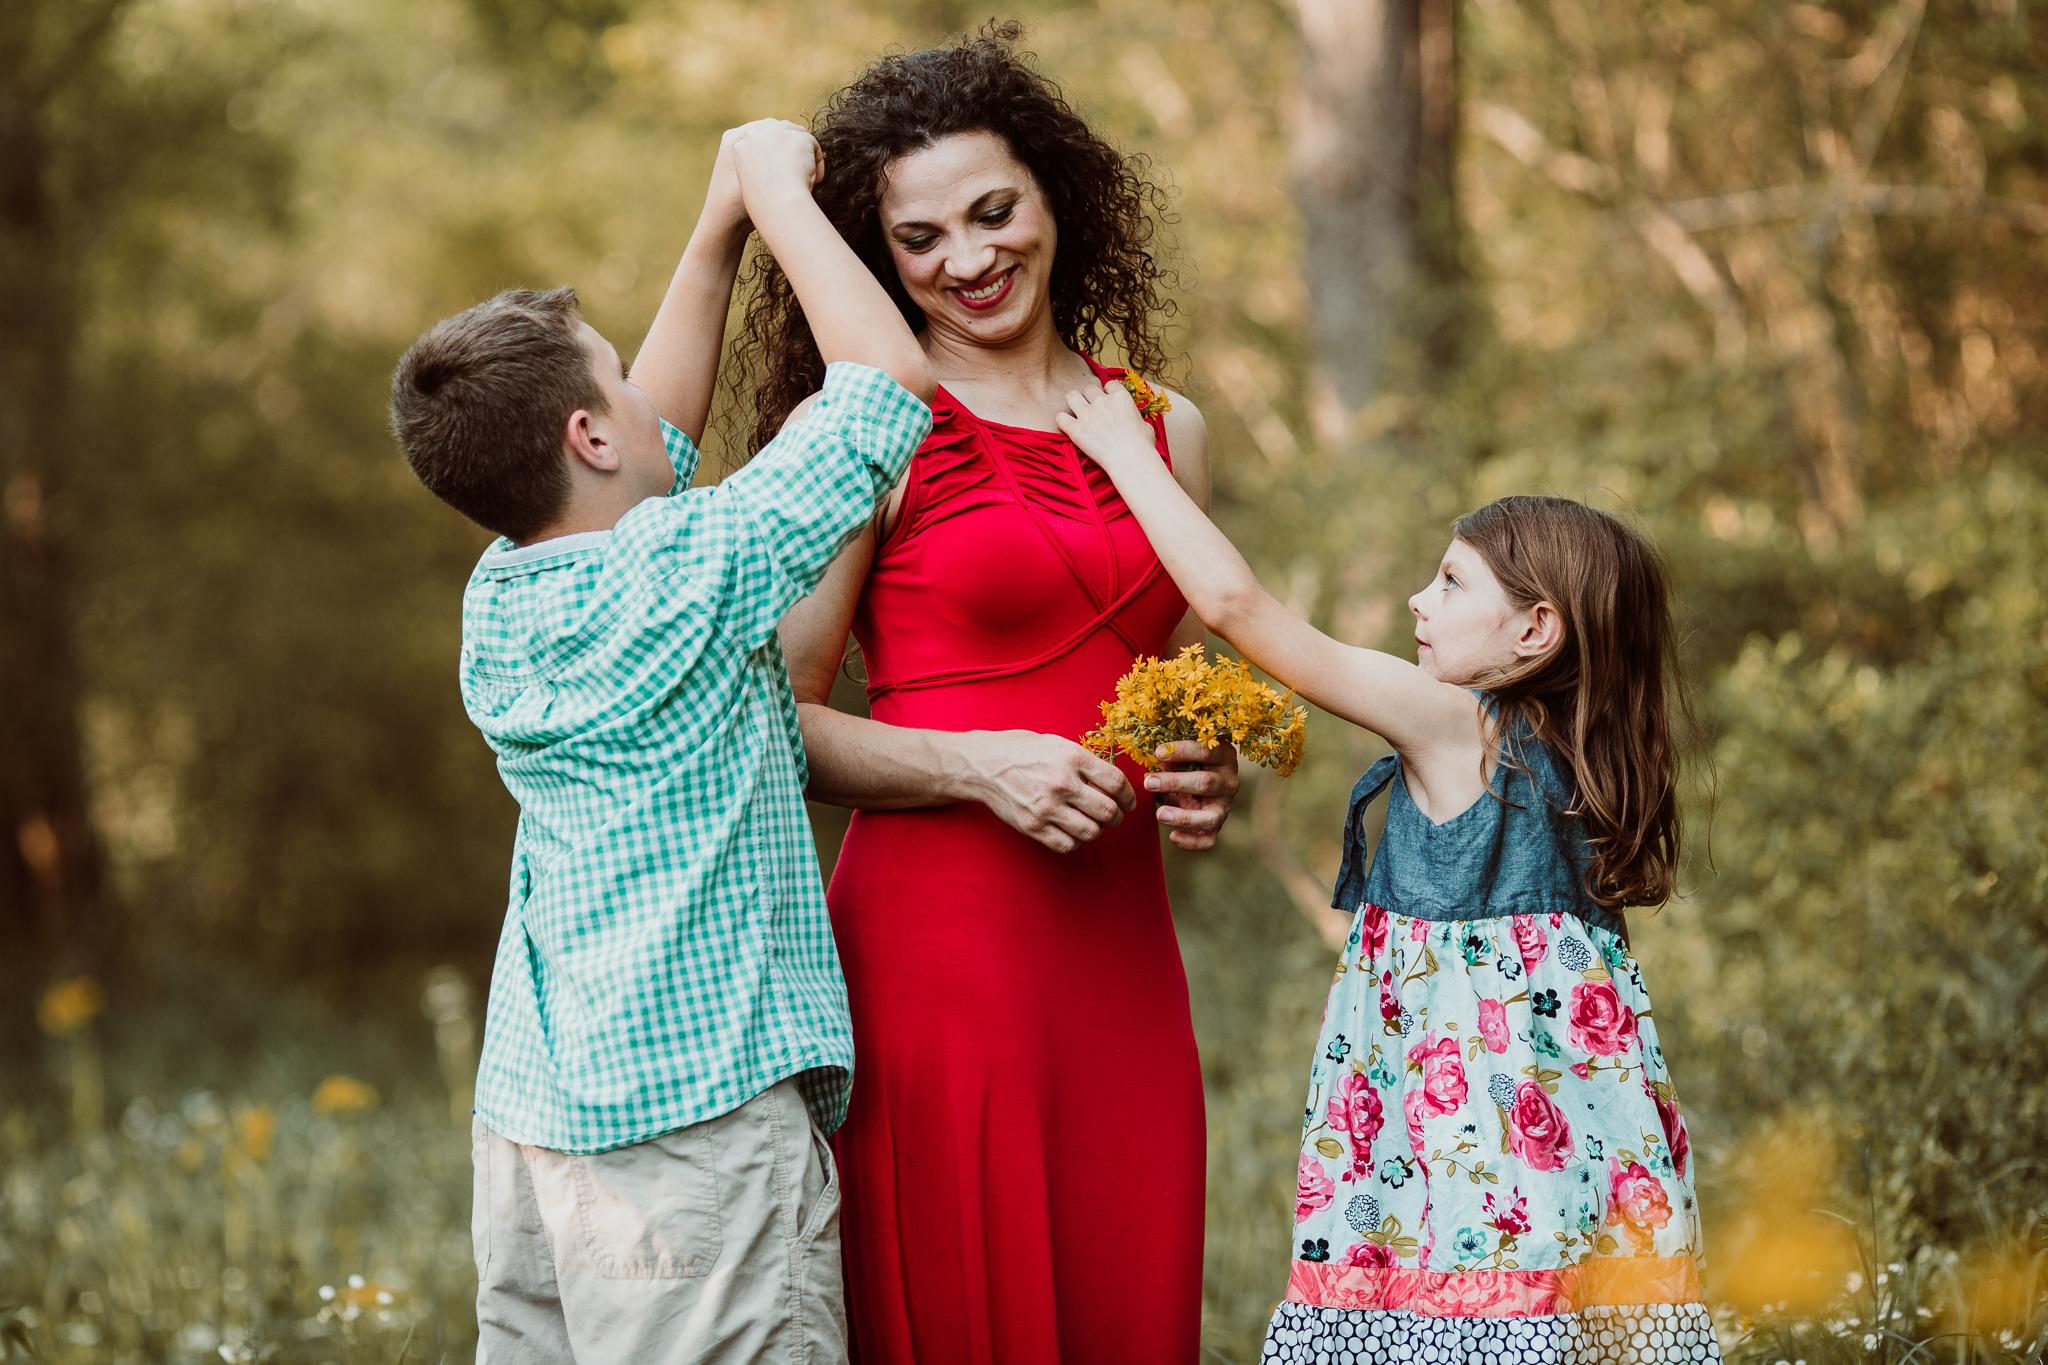 family plucking flowers